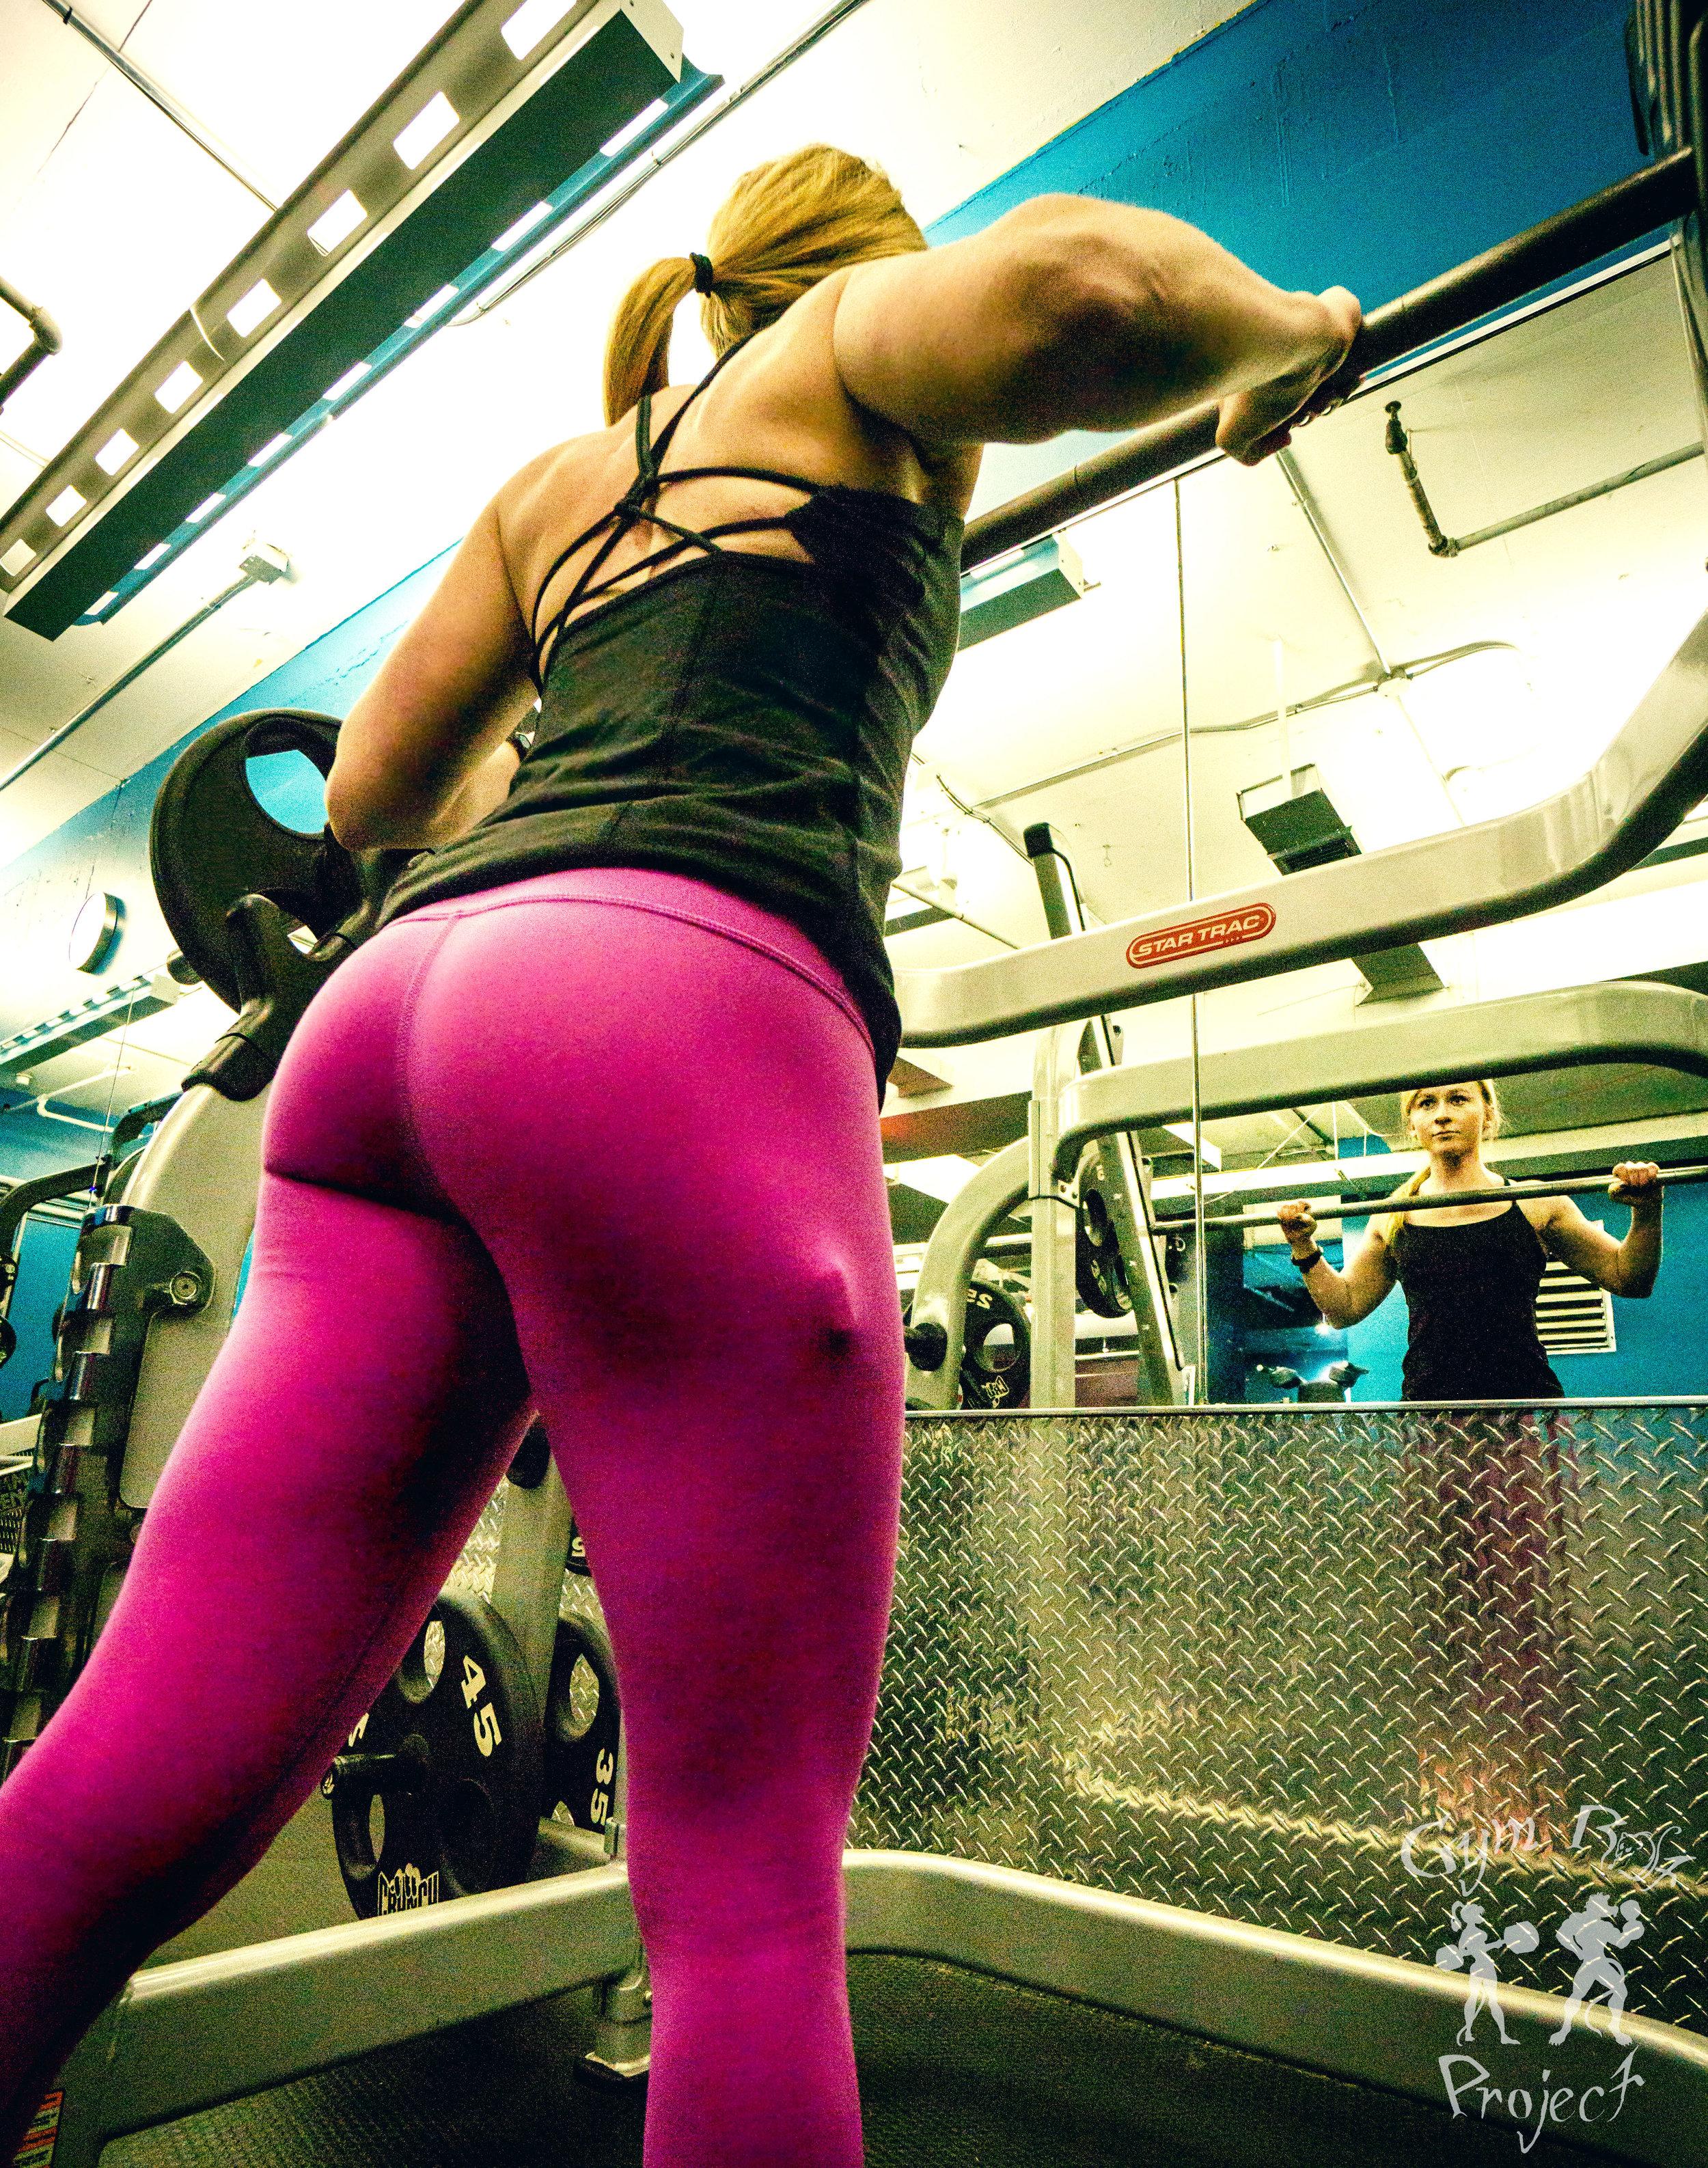 gym-rat-project-vickygood-photography2.jpg